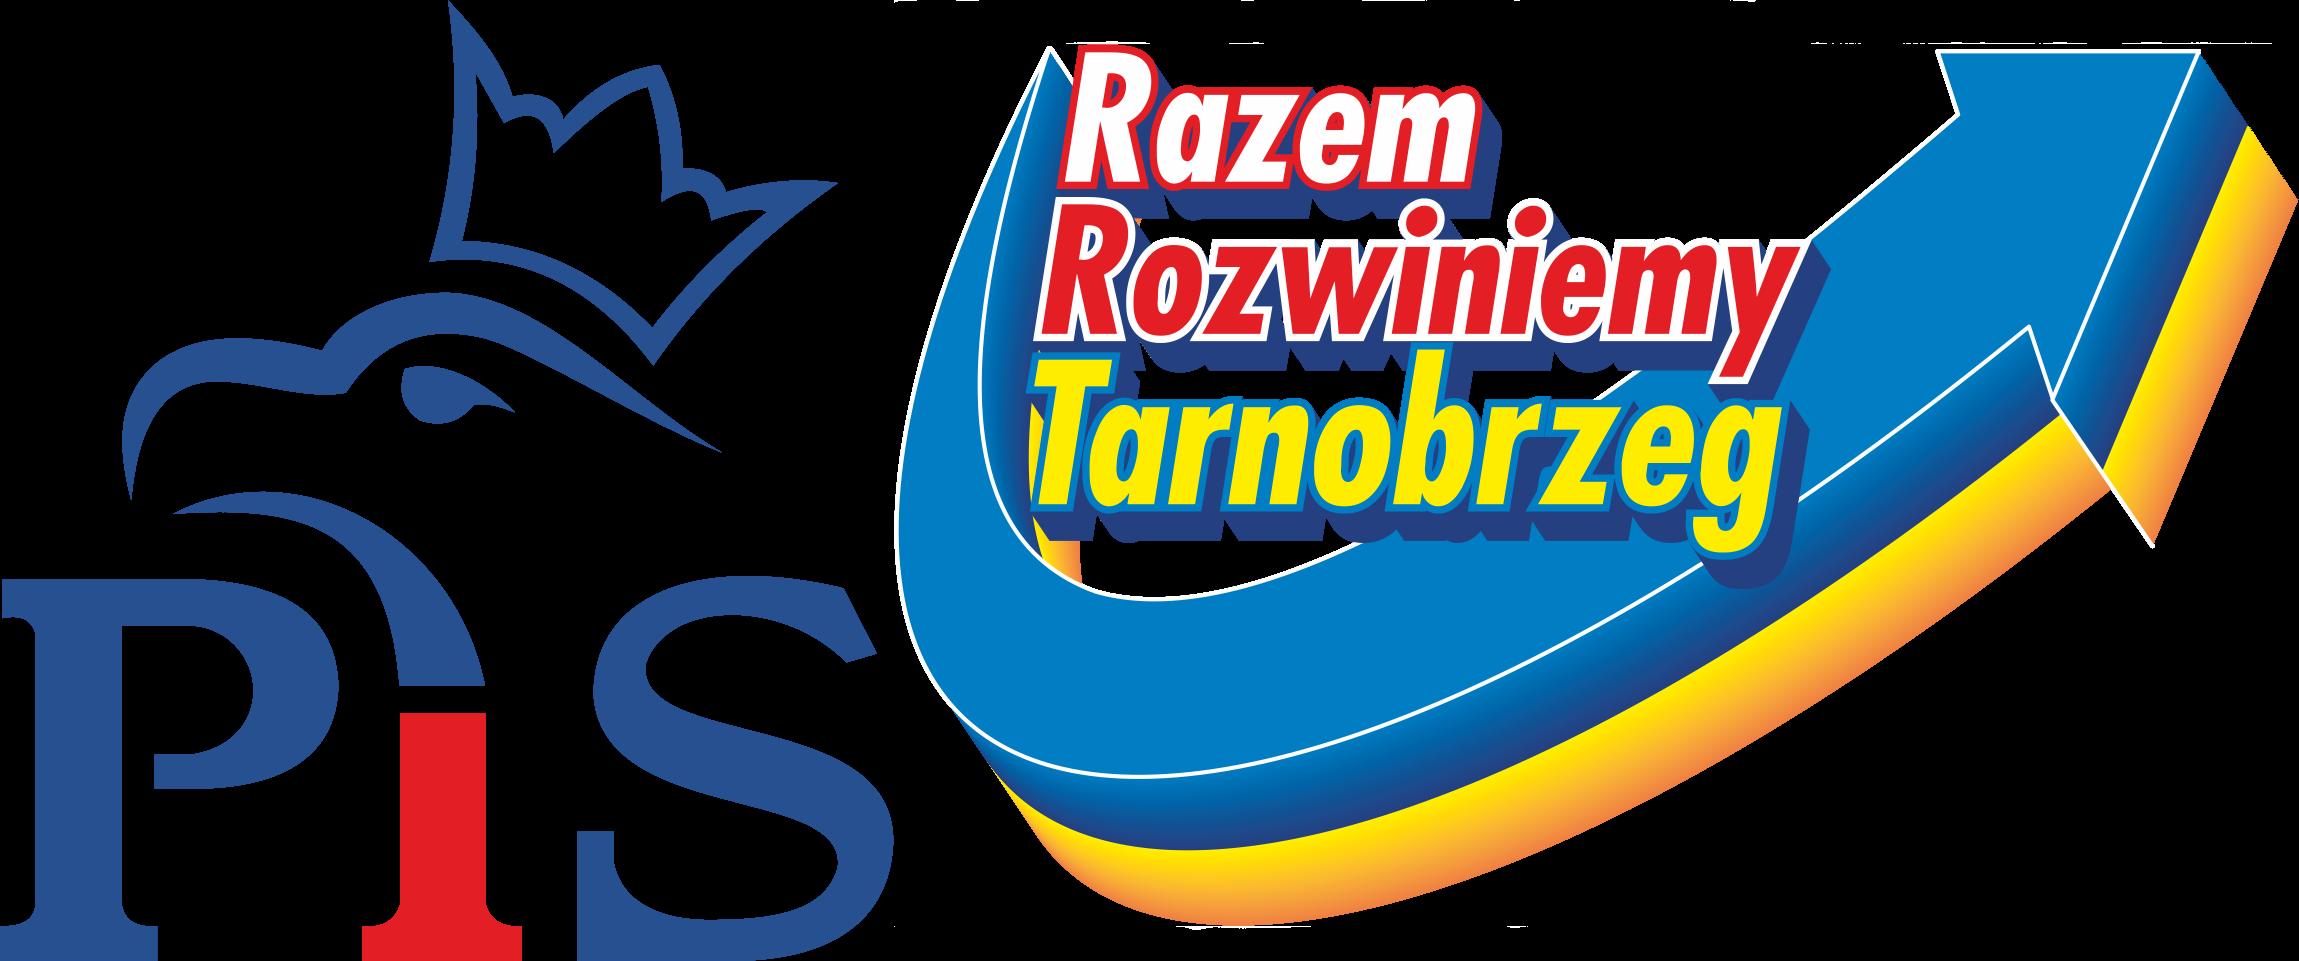 pistarnobrzeg.pl